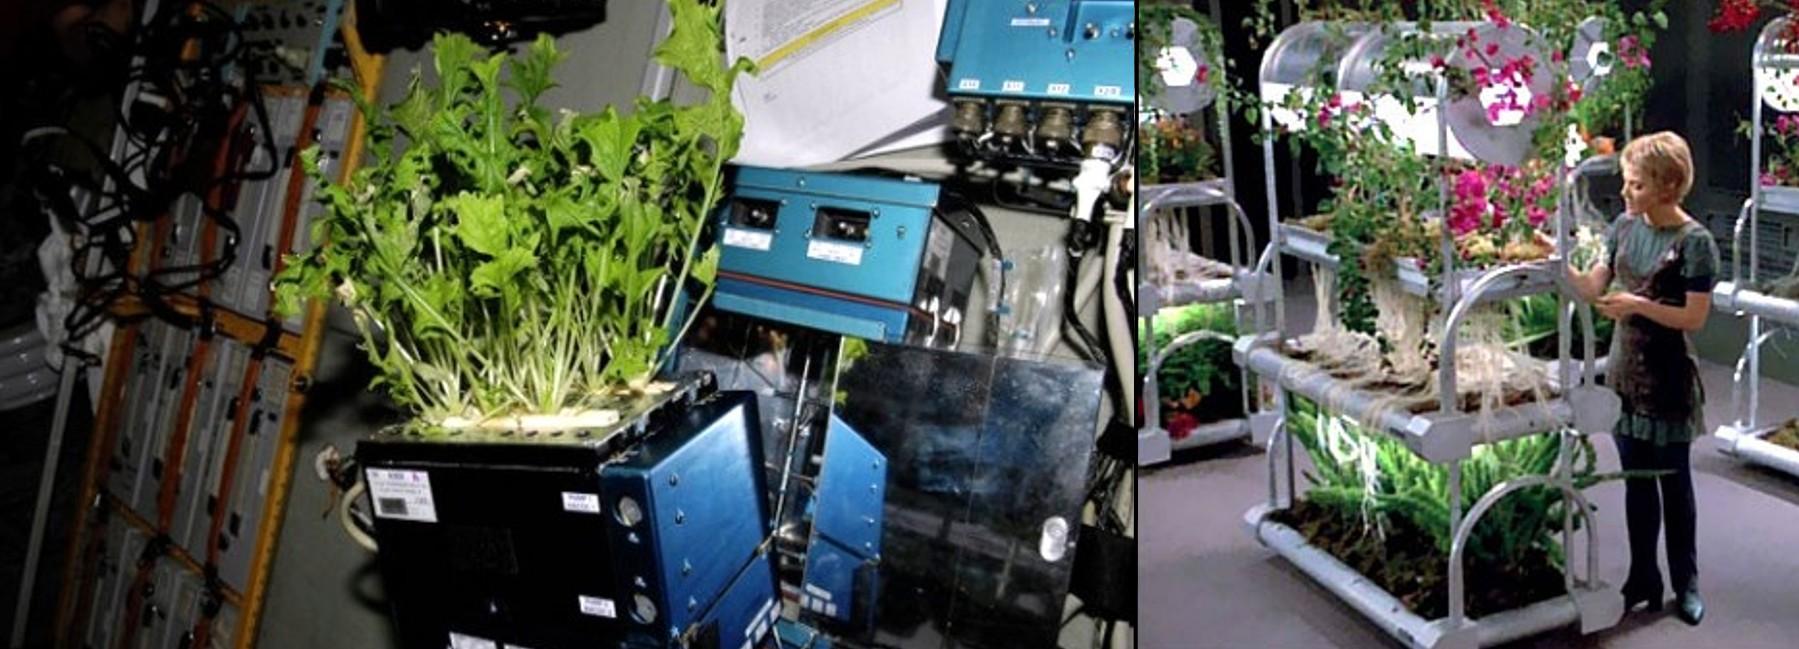 ISS vs Voyager Garden